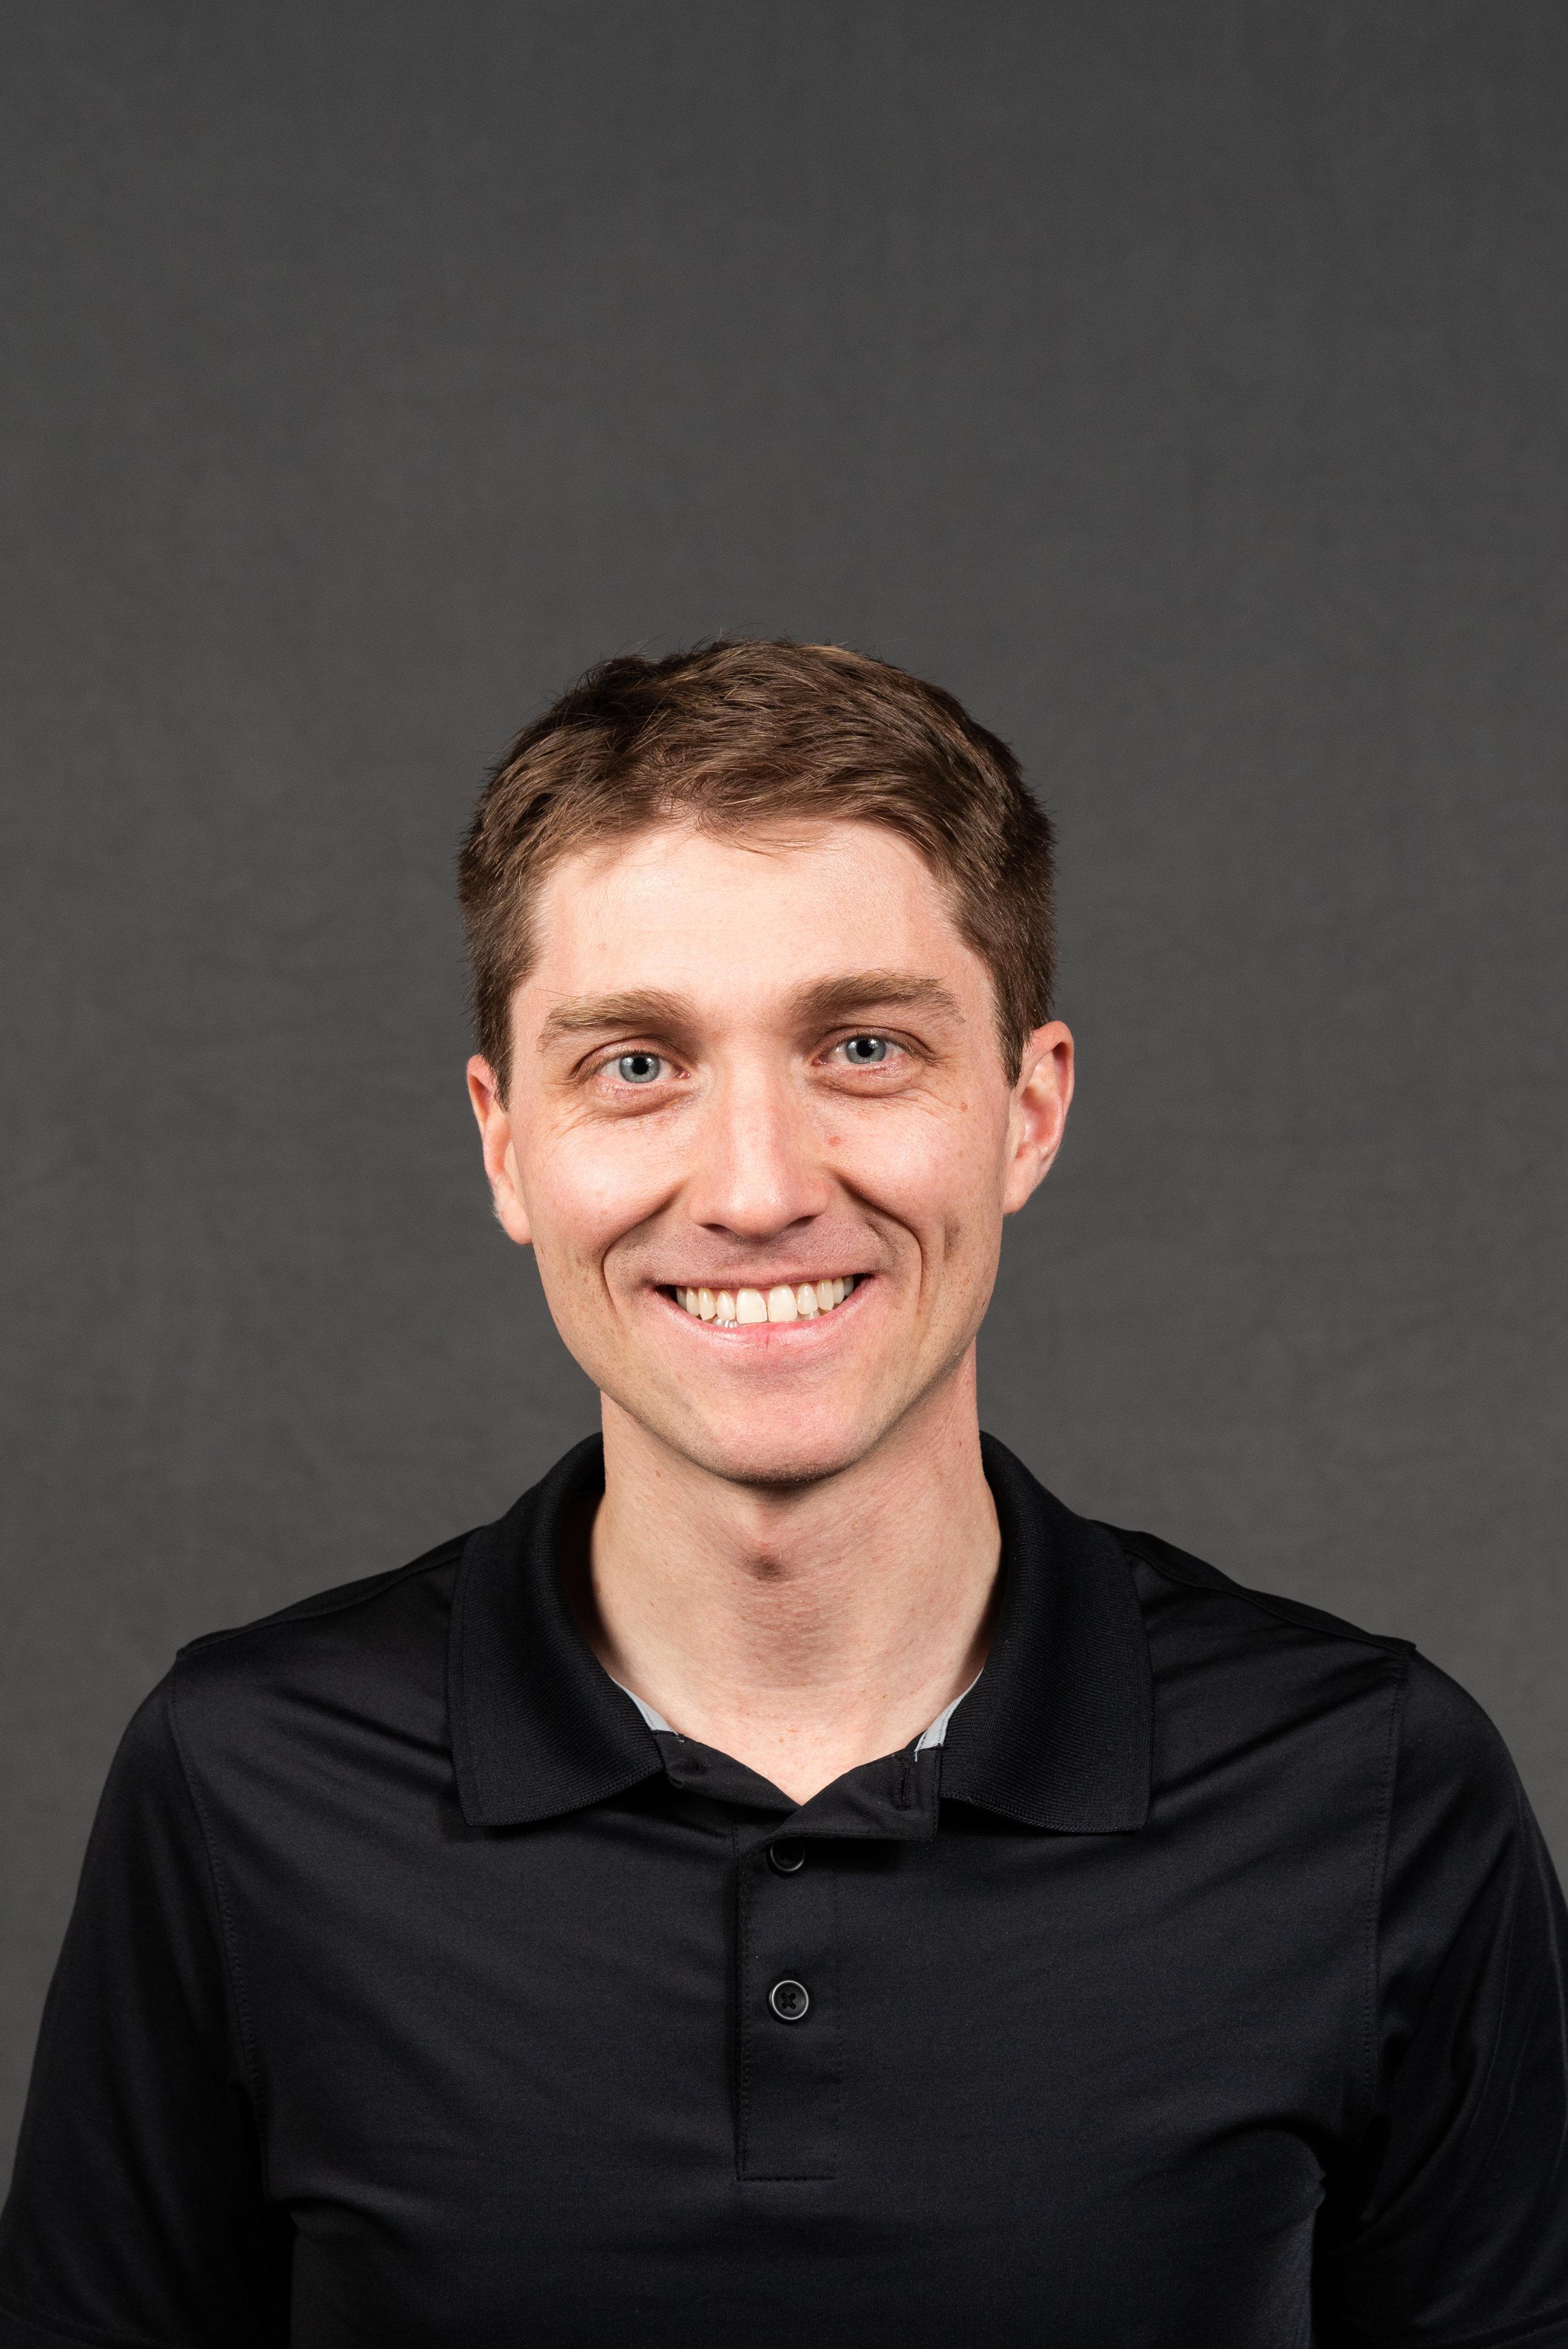 Kyle Stetson   Senior Lighting Designer & Project Manager   Email